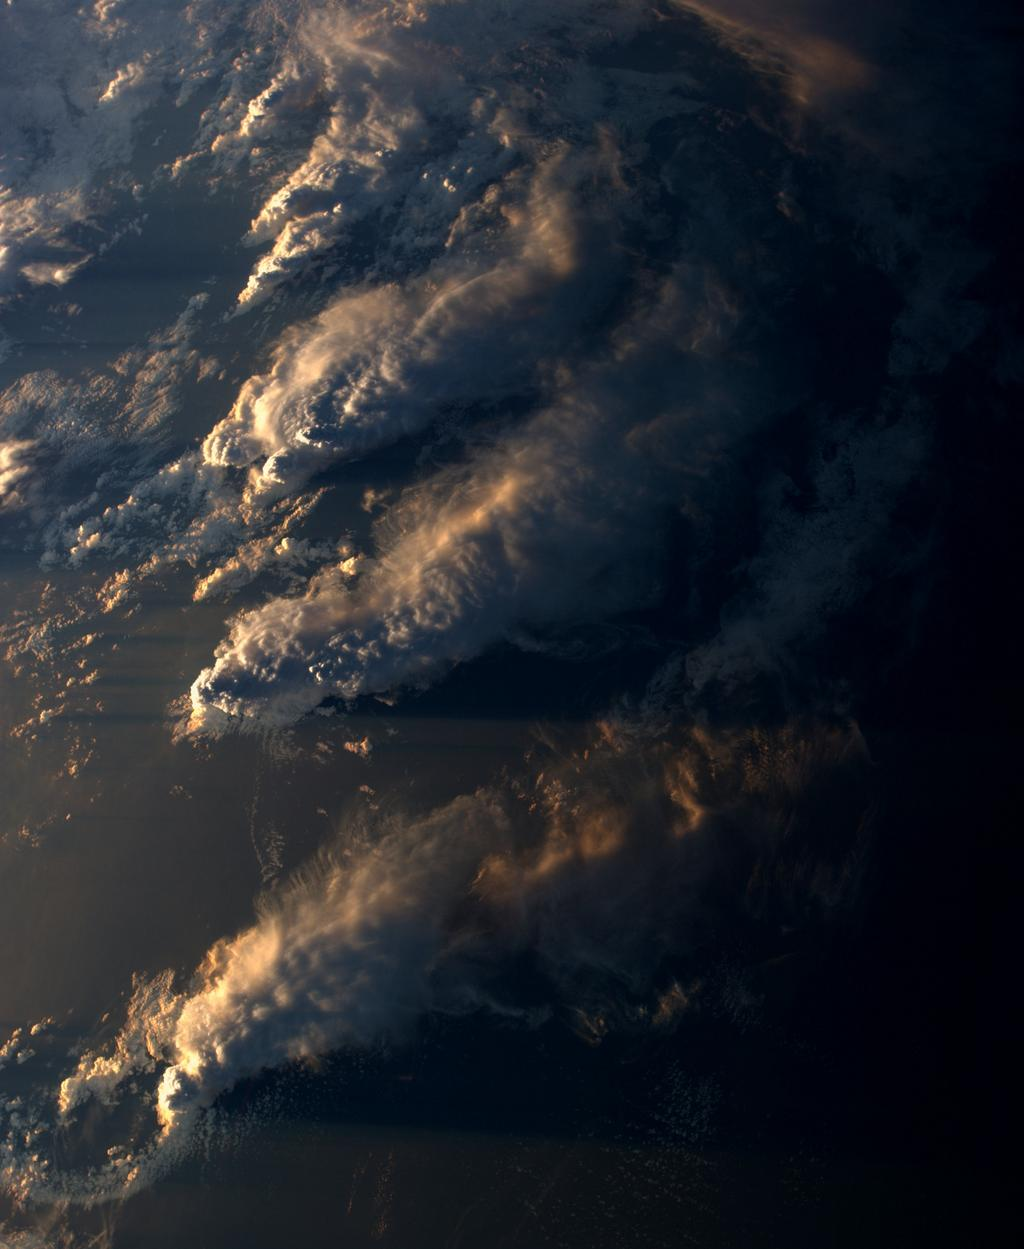 Simply striking. @Astro_Alex: Wolkenschatten / Cloud shadows #BlueDot http://t.co/kGPHzWefhP